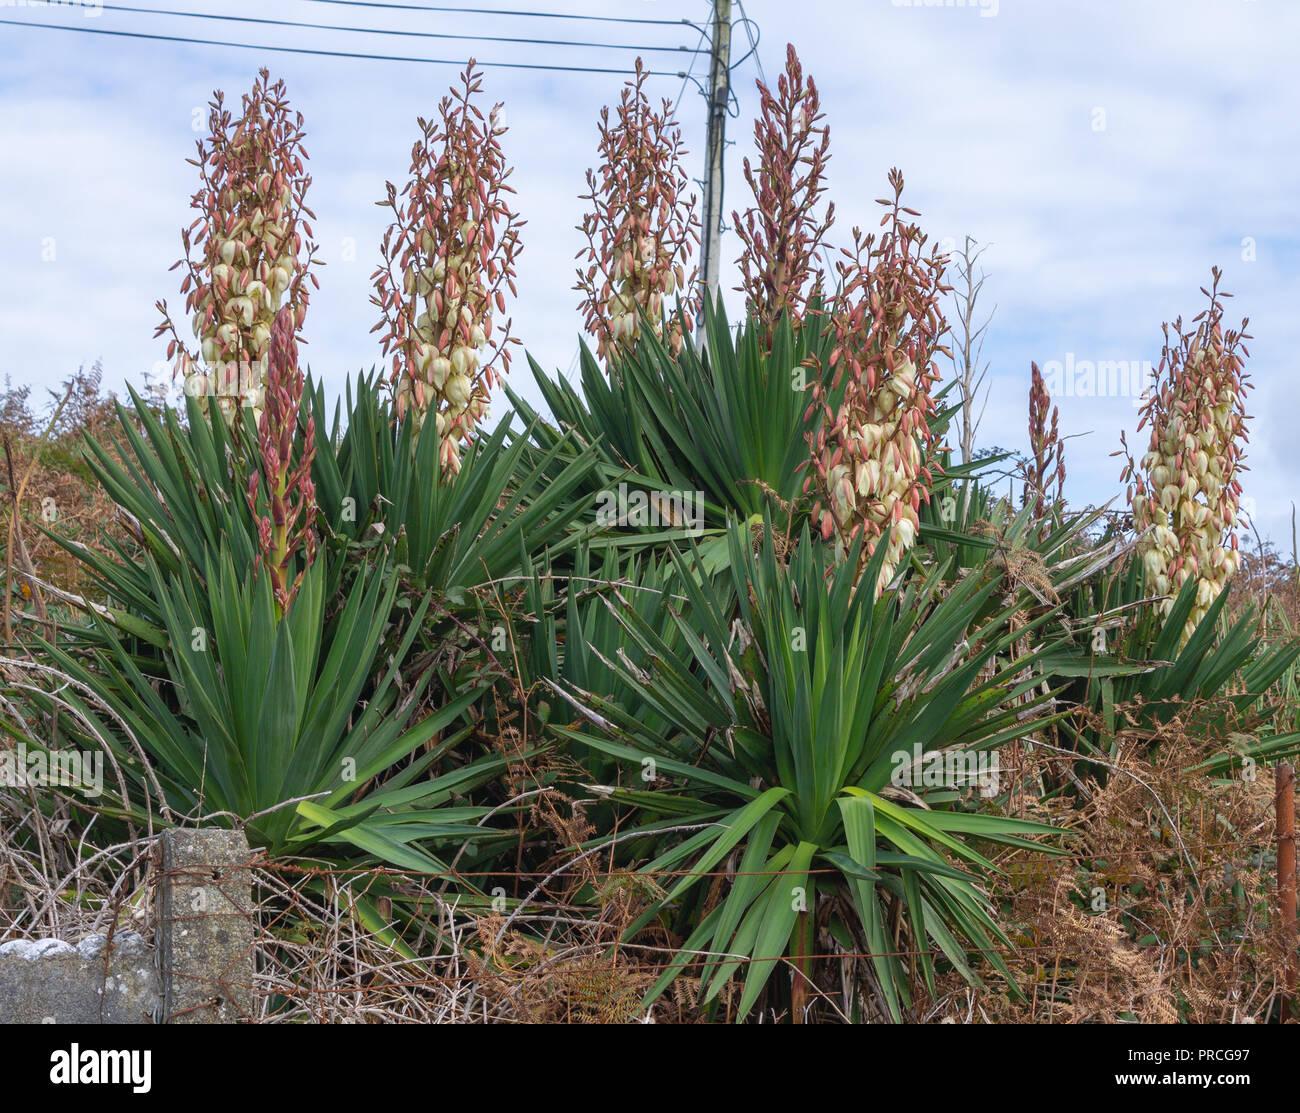 yukka-plant-flowering-growing-amongst-ferns-in-west-cork-ireland-PRCG97.jpg